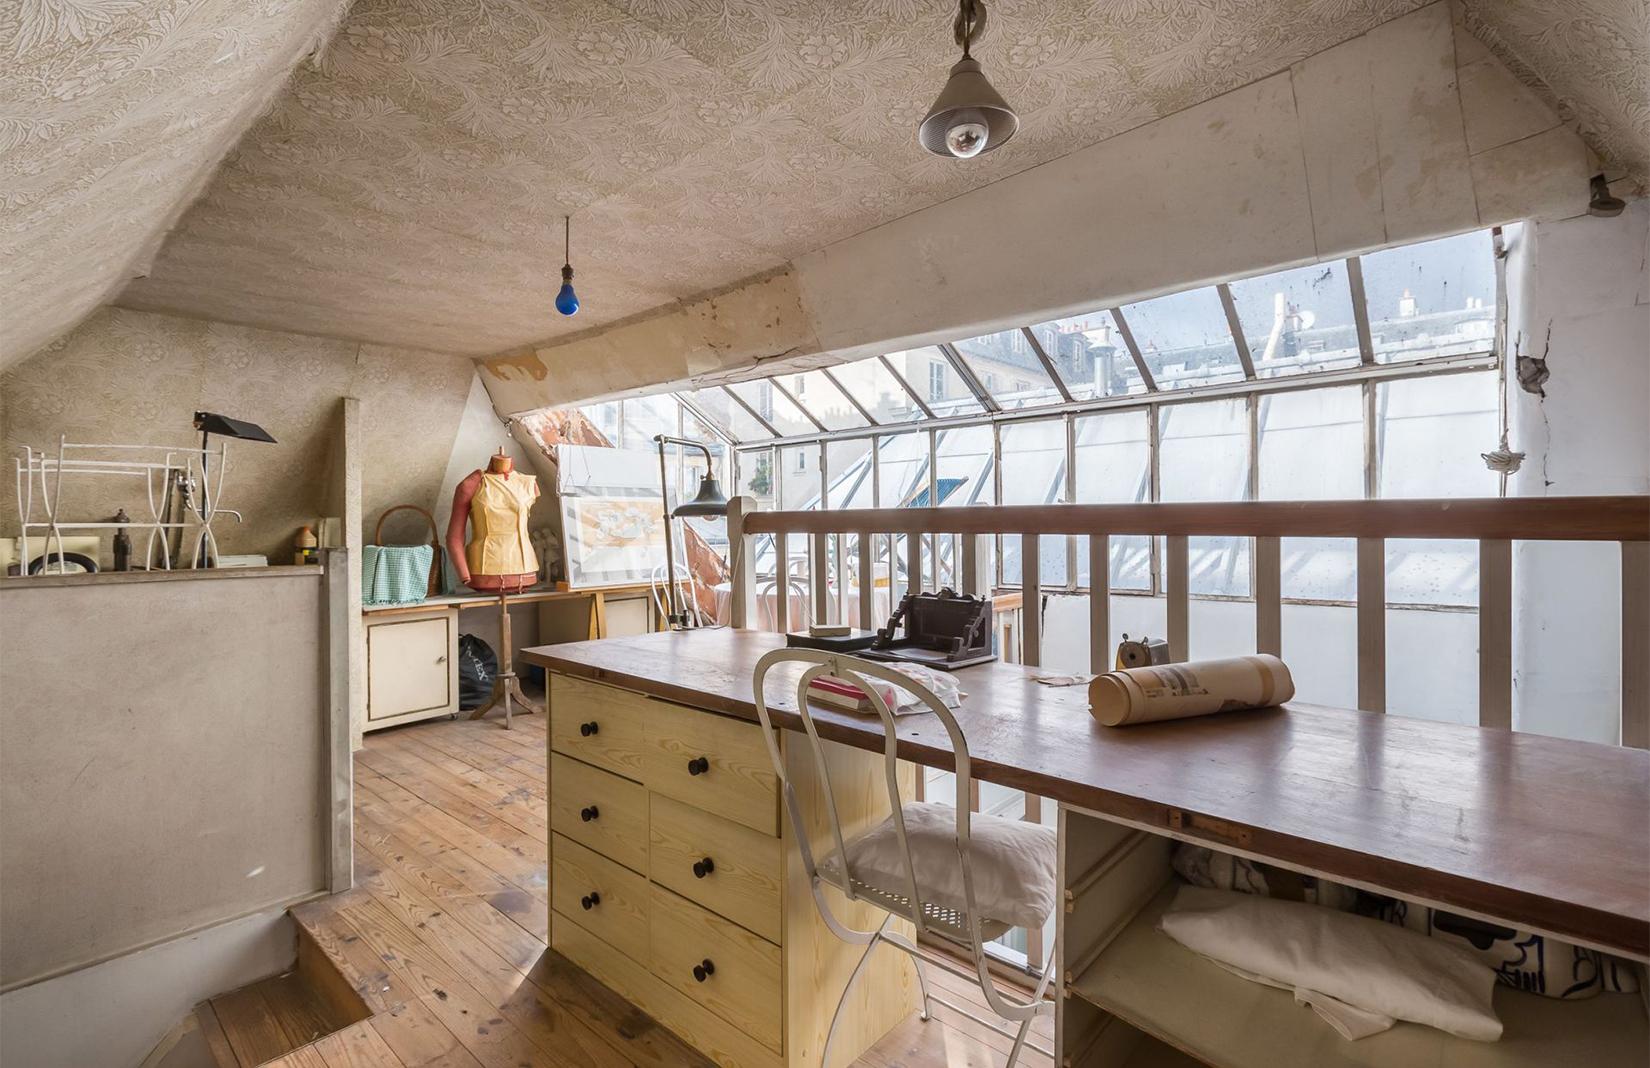 Paris artists home: light-filled atelier